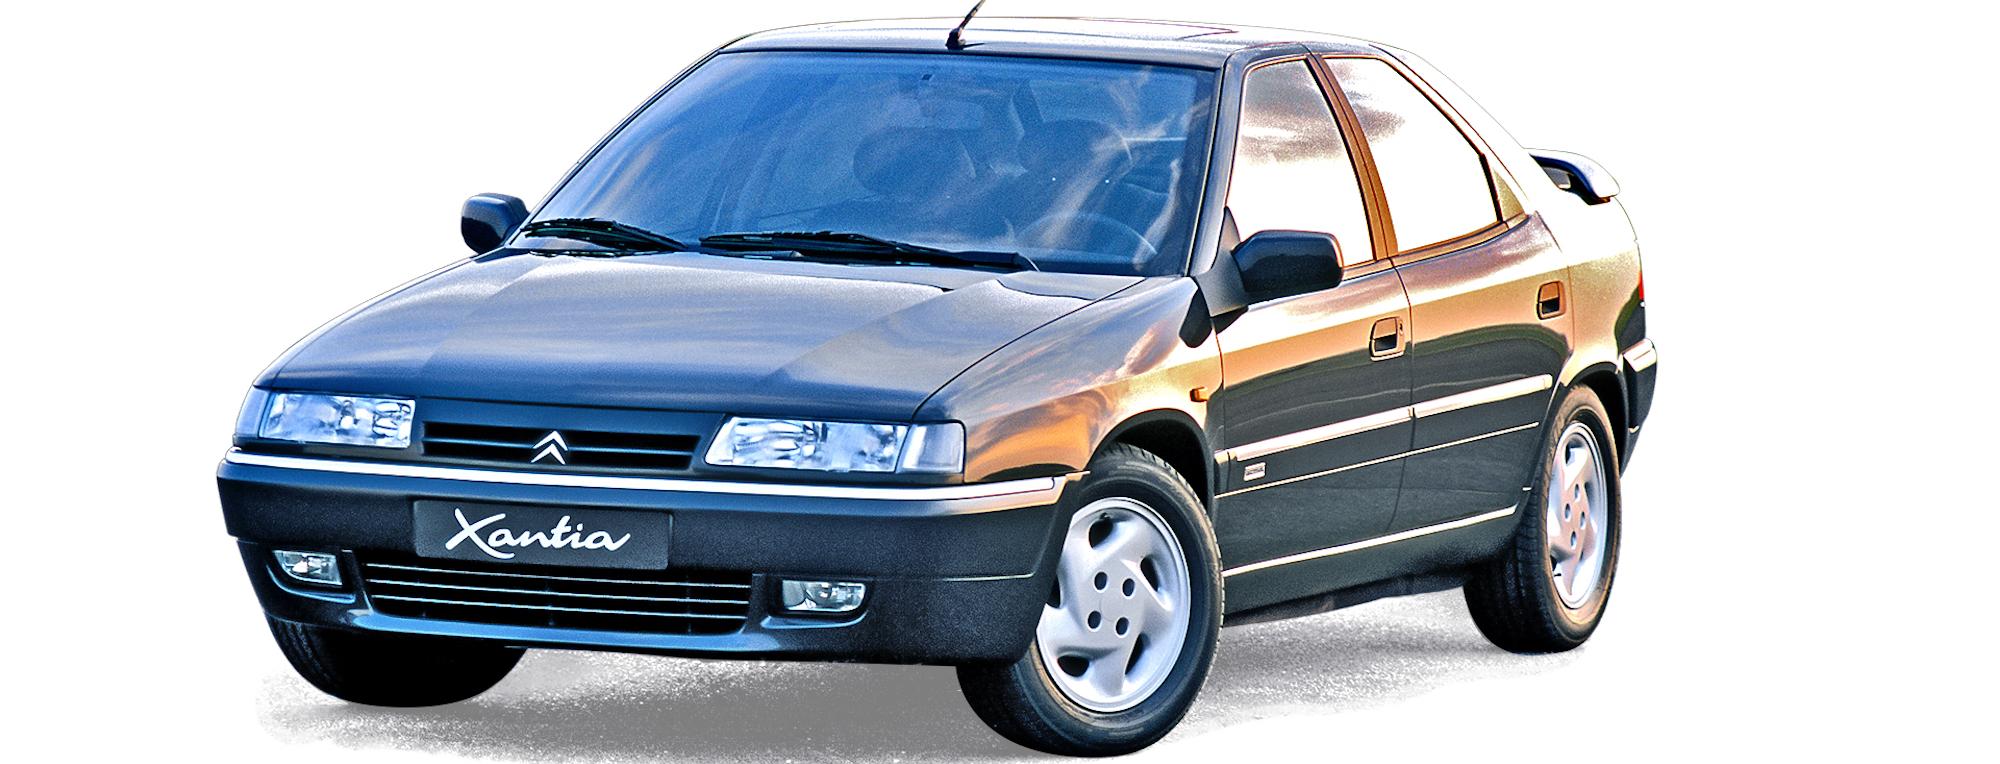 Citroen Xantia (1993-2001)